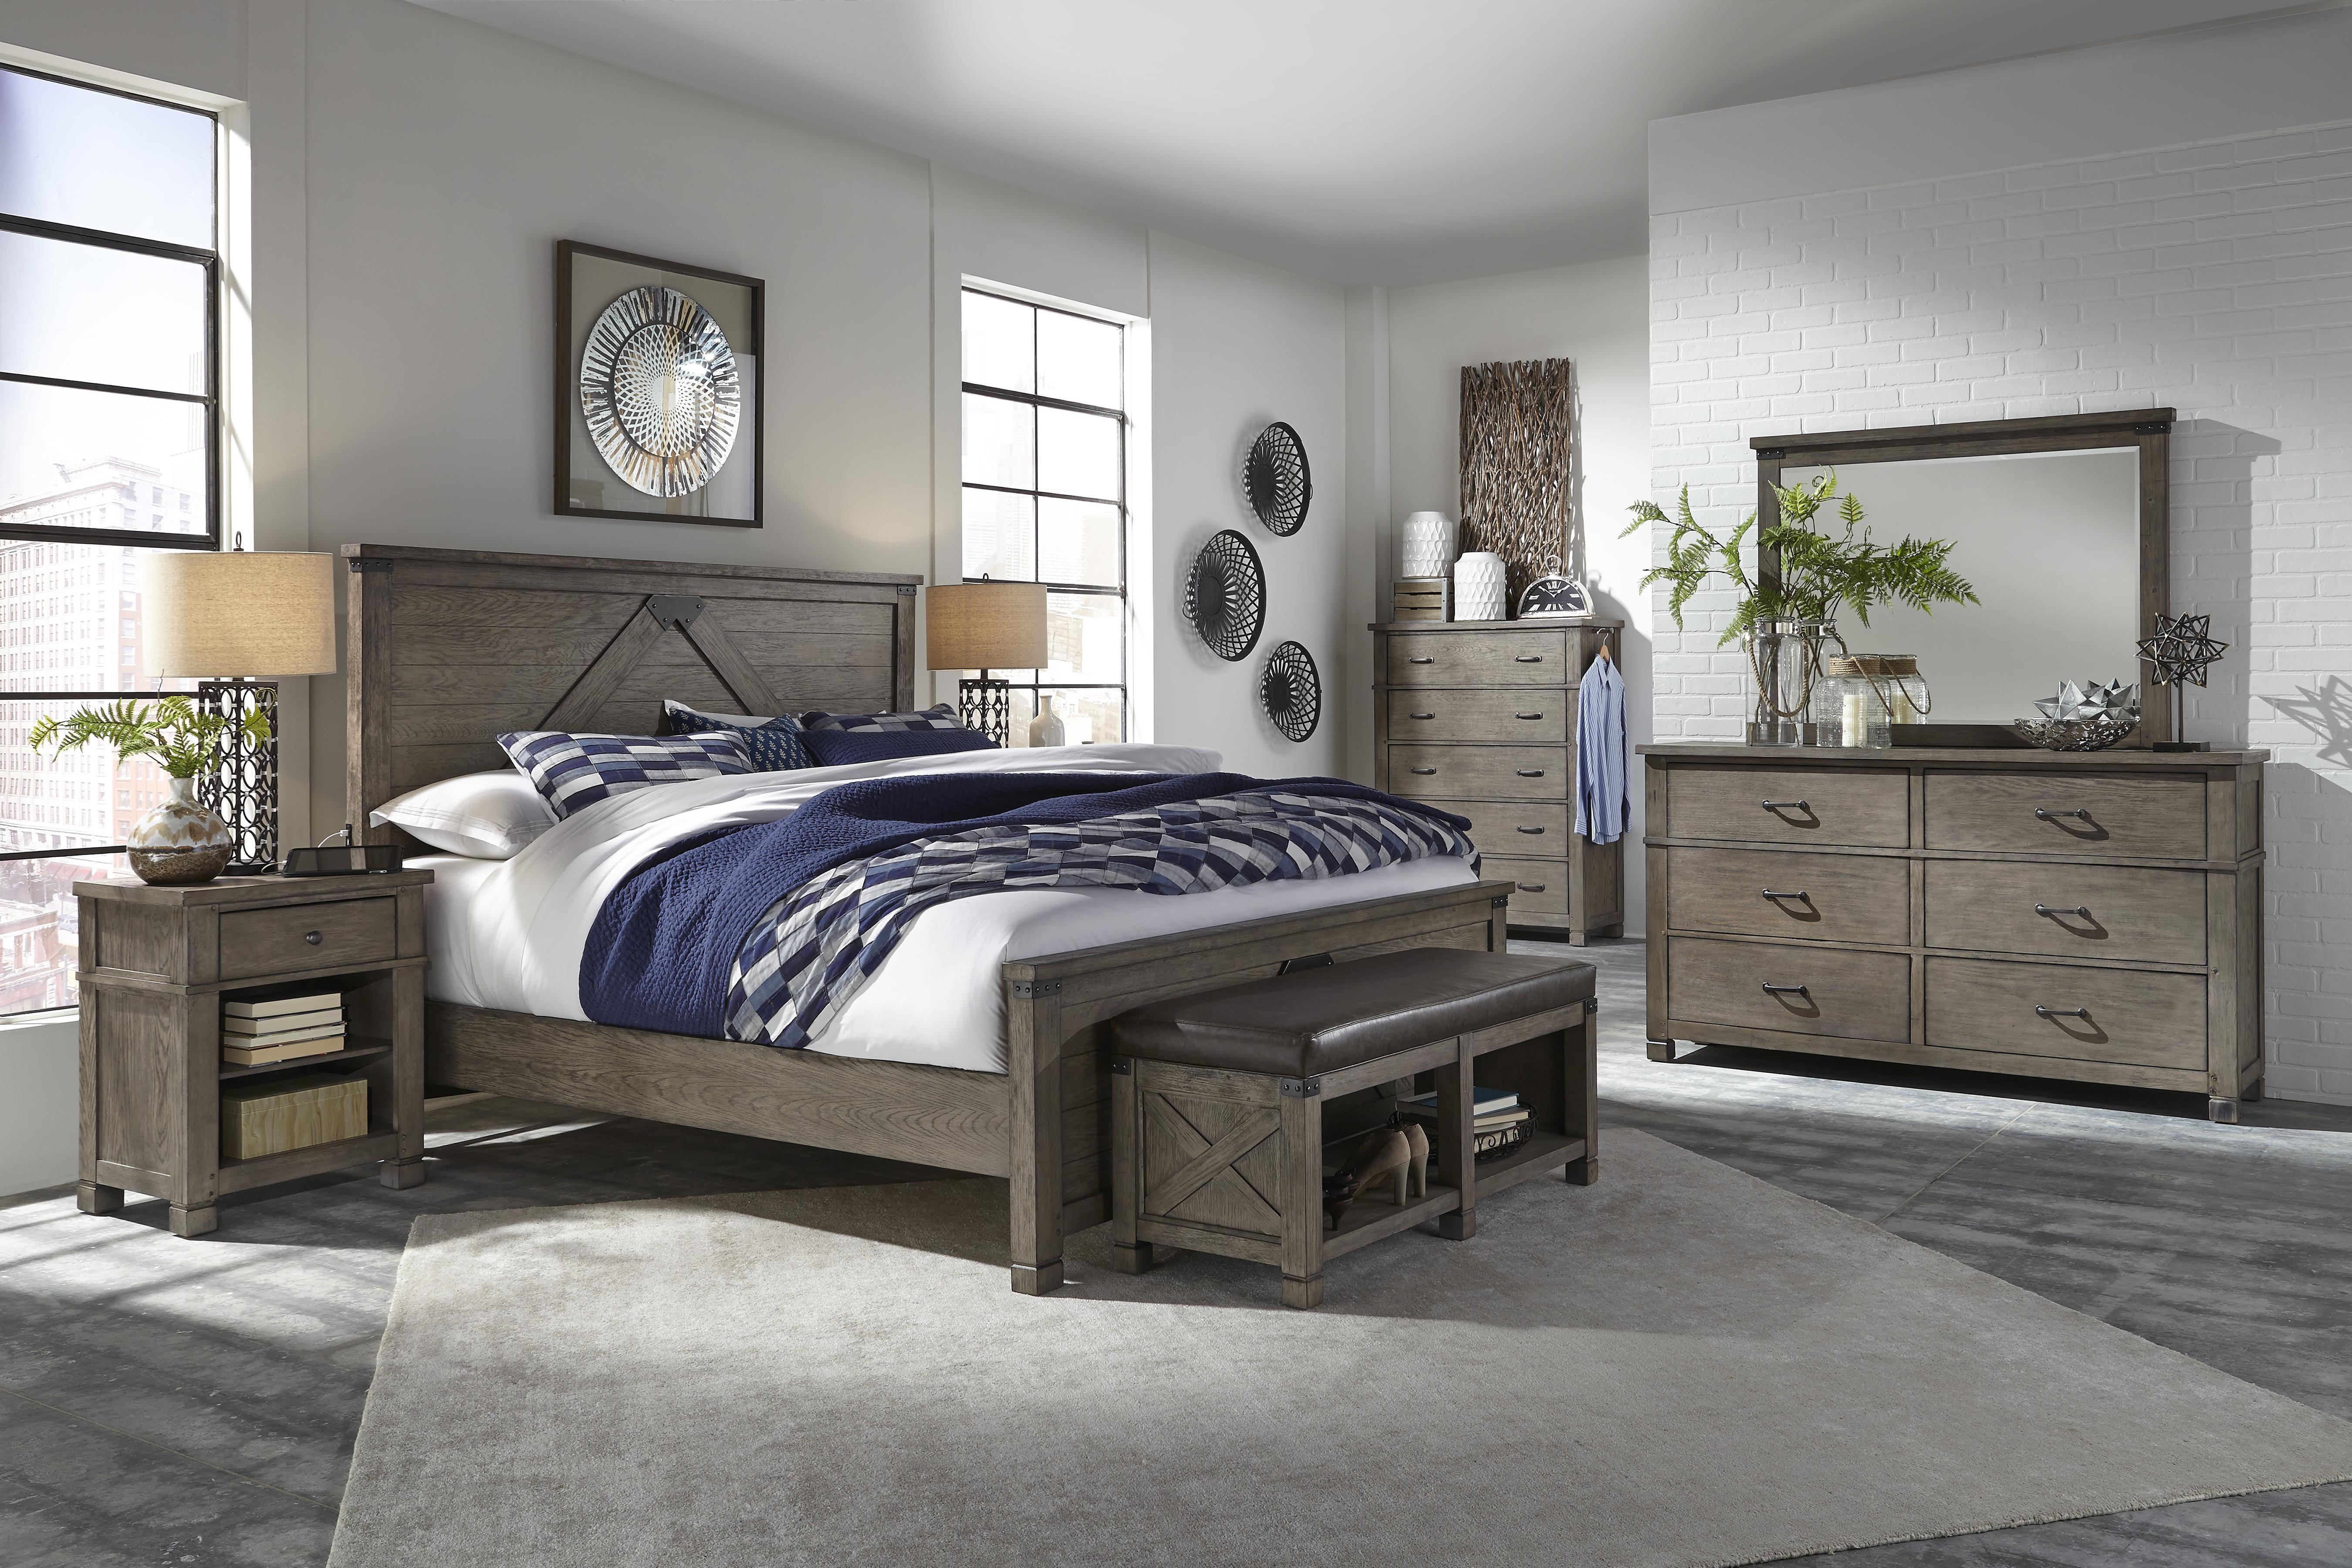 Aspenhome Furniture I45 453 Bedroom Tucker Dresser